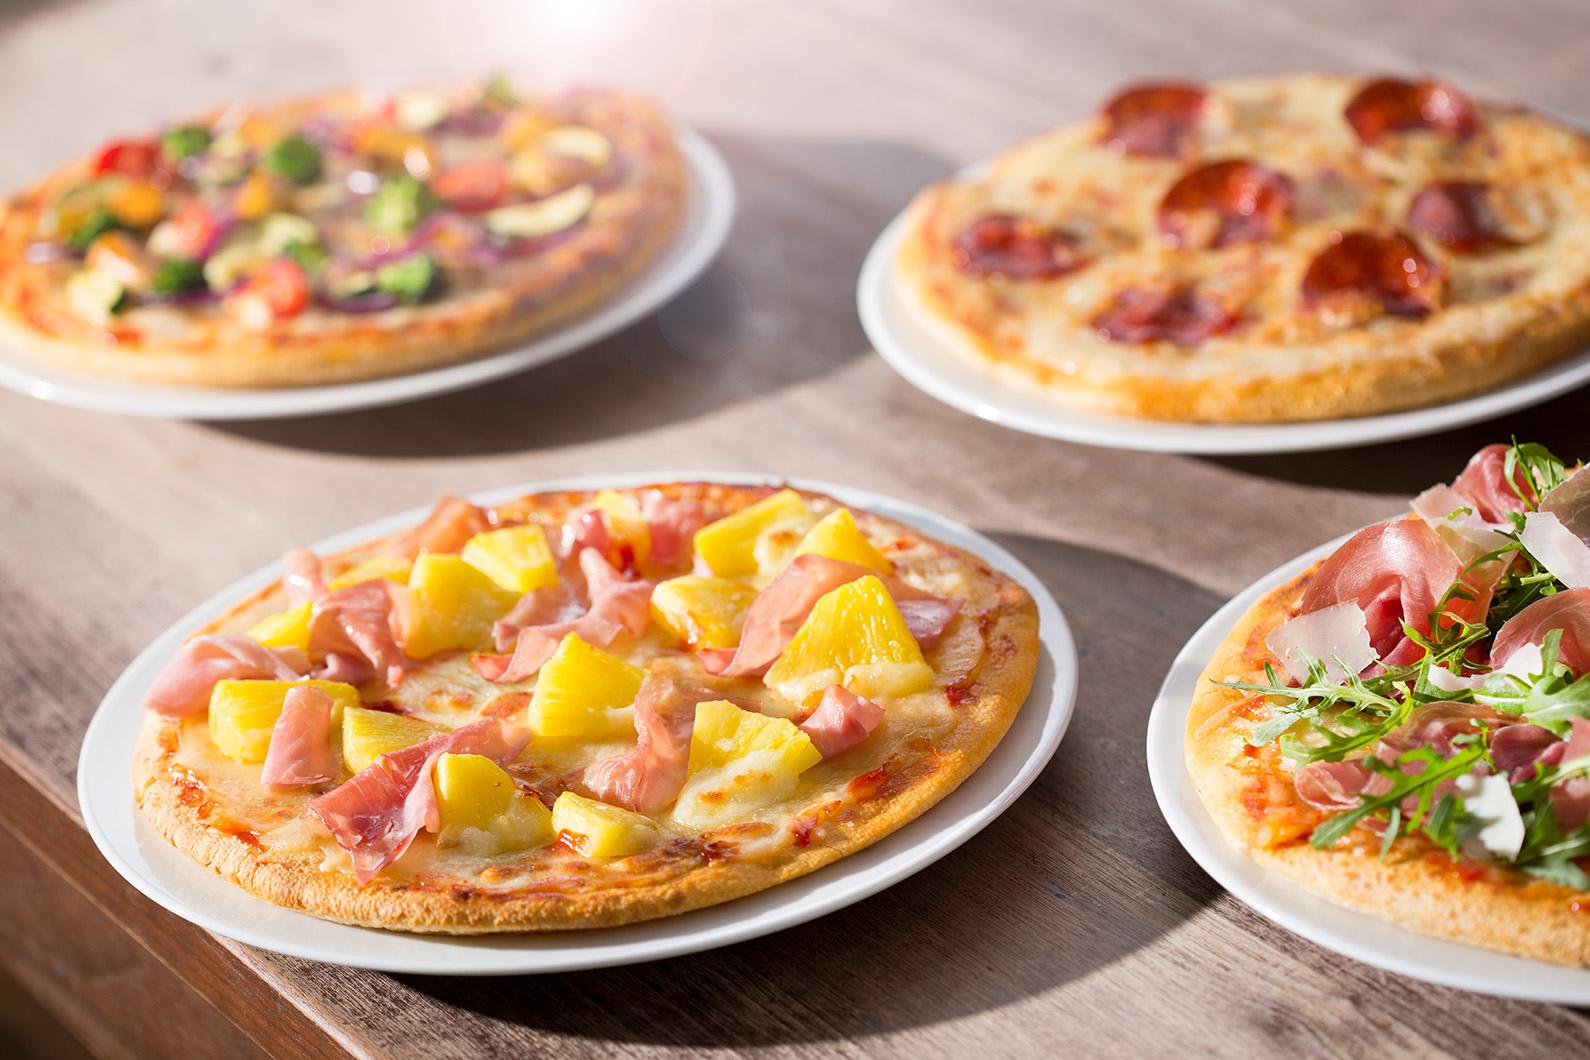 Fotos de MUNDFEIN Pizzawerkstatt Düren